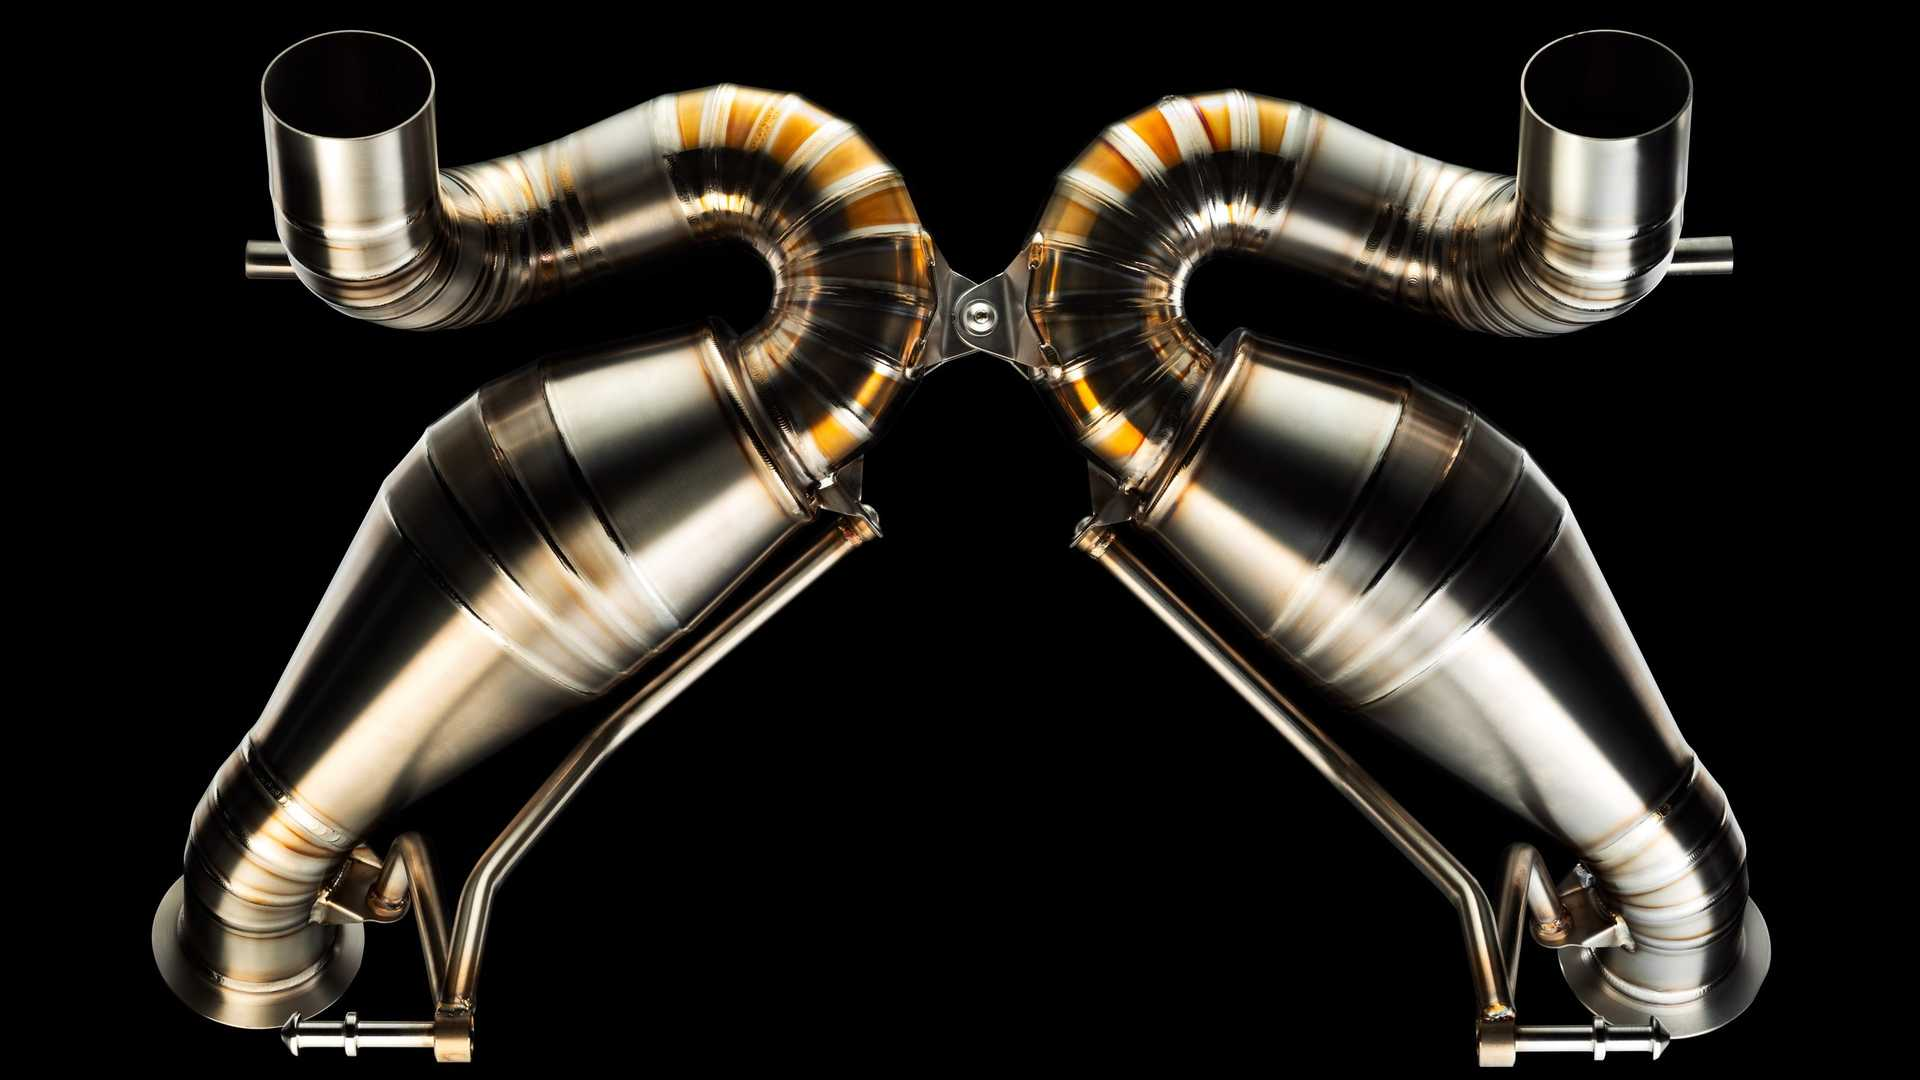 Valentino Balbon Lamborghini Aventador SVJ Exhaust 4